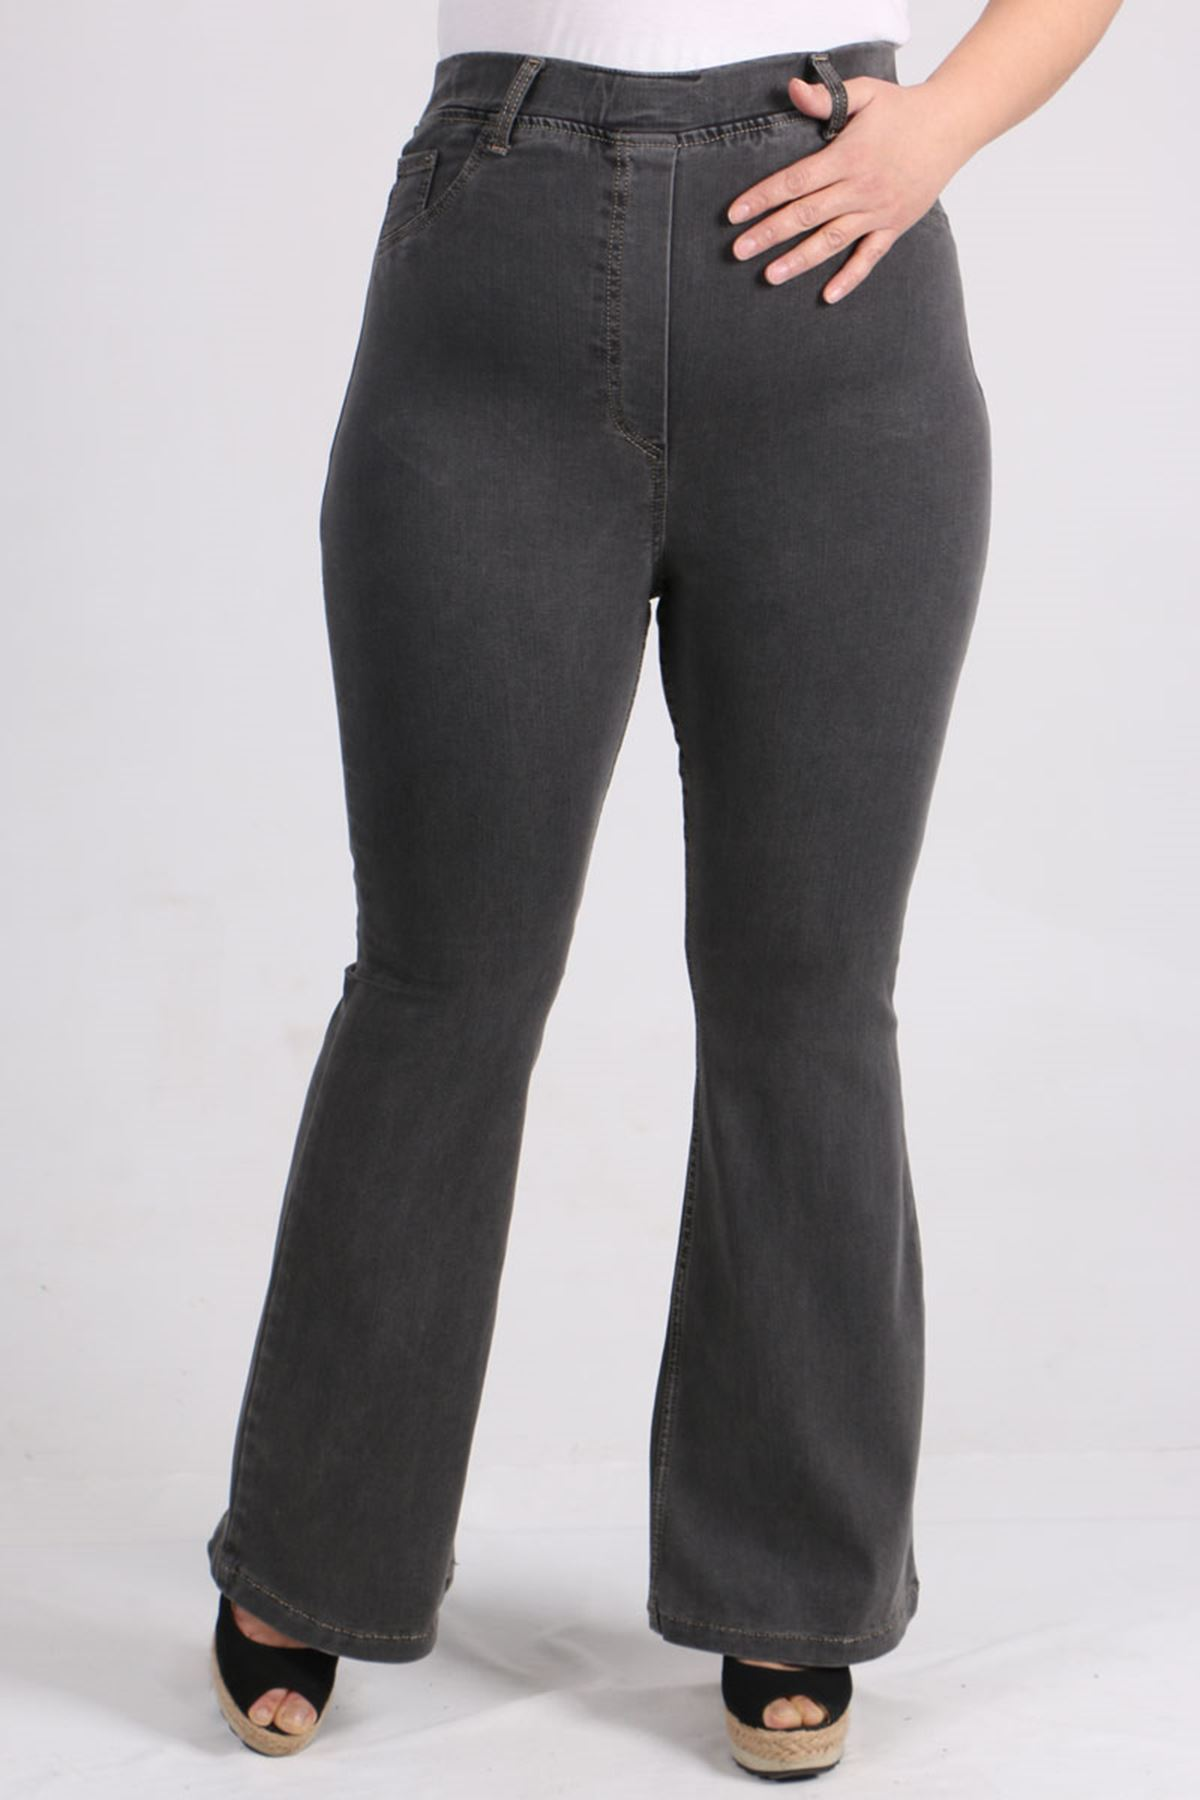 9137 Büyük Beden Beli Lastikli İspanyol Paça Kot Pantalon-Antrasit